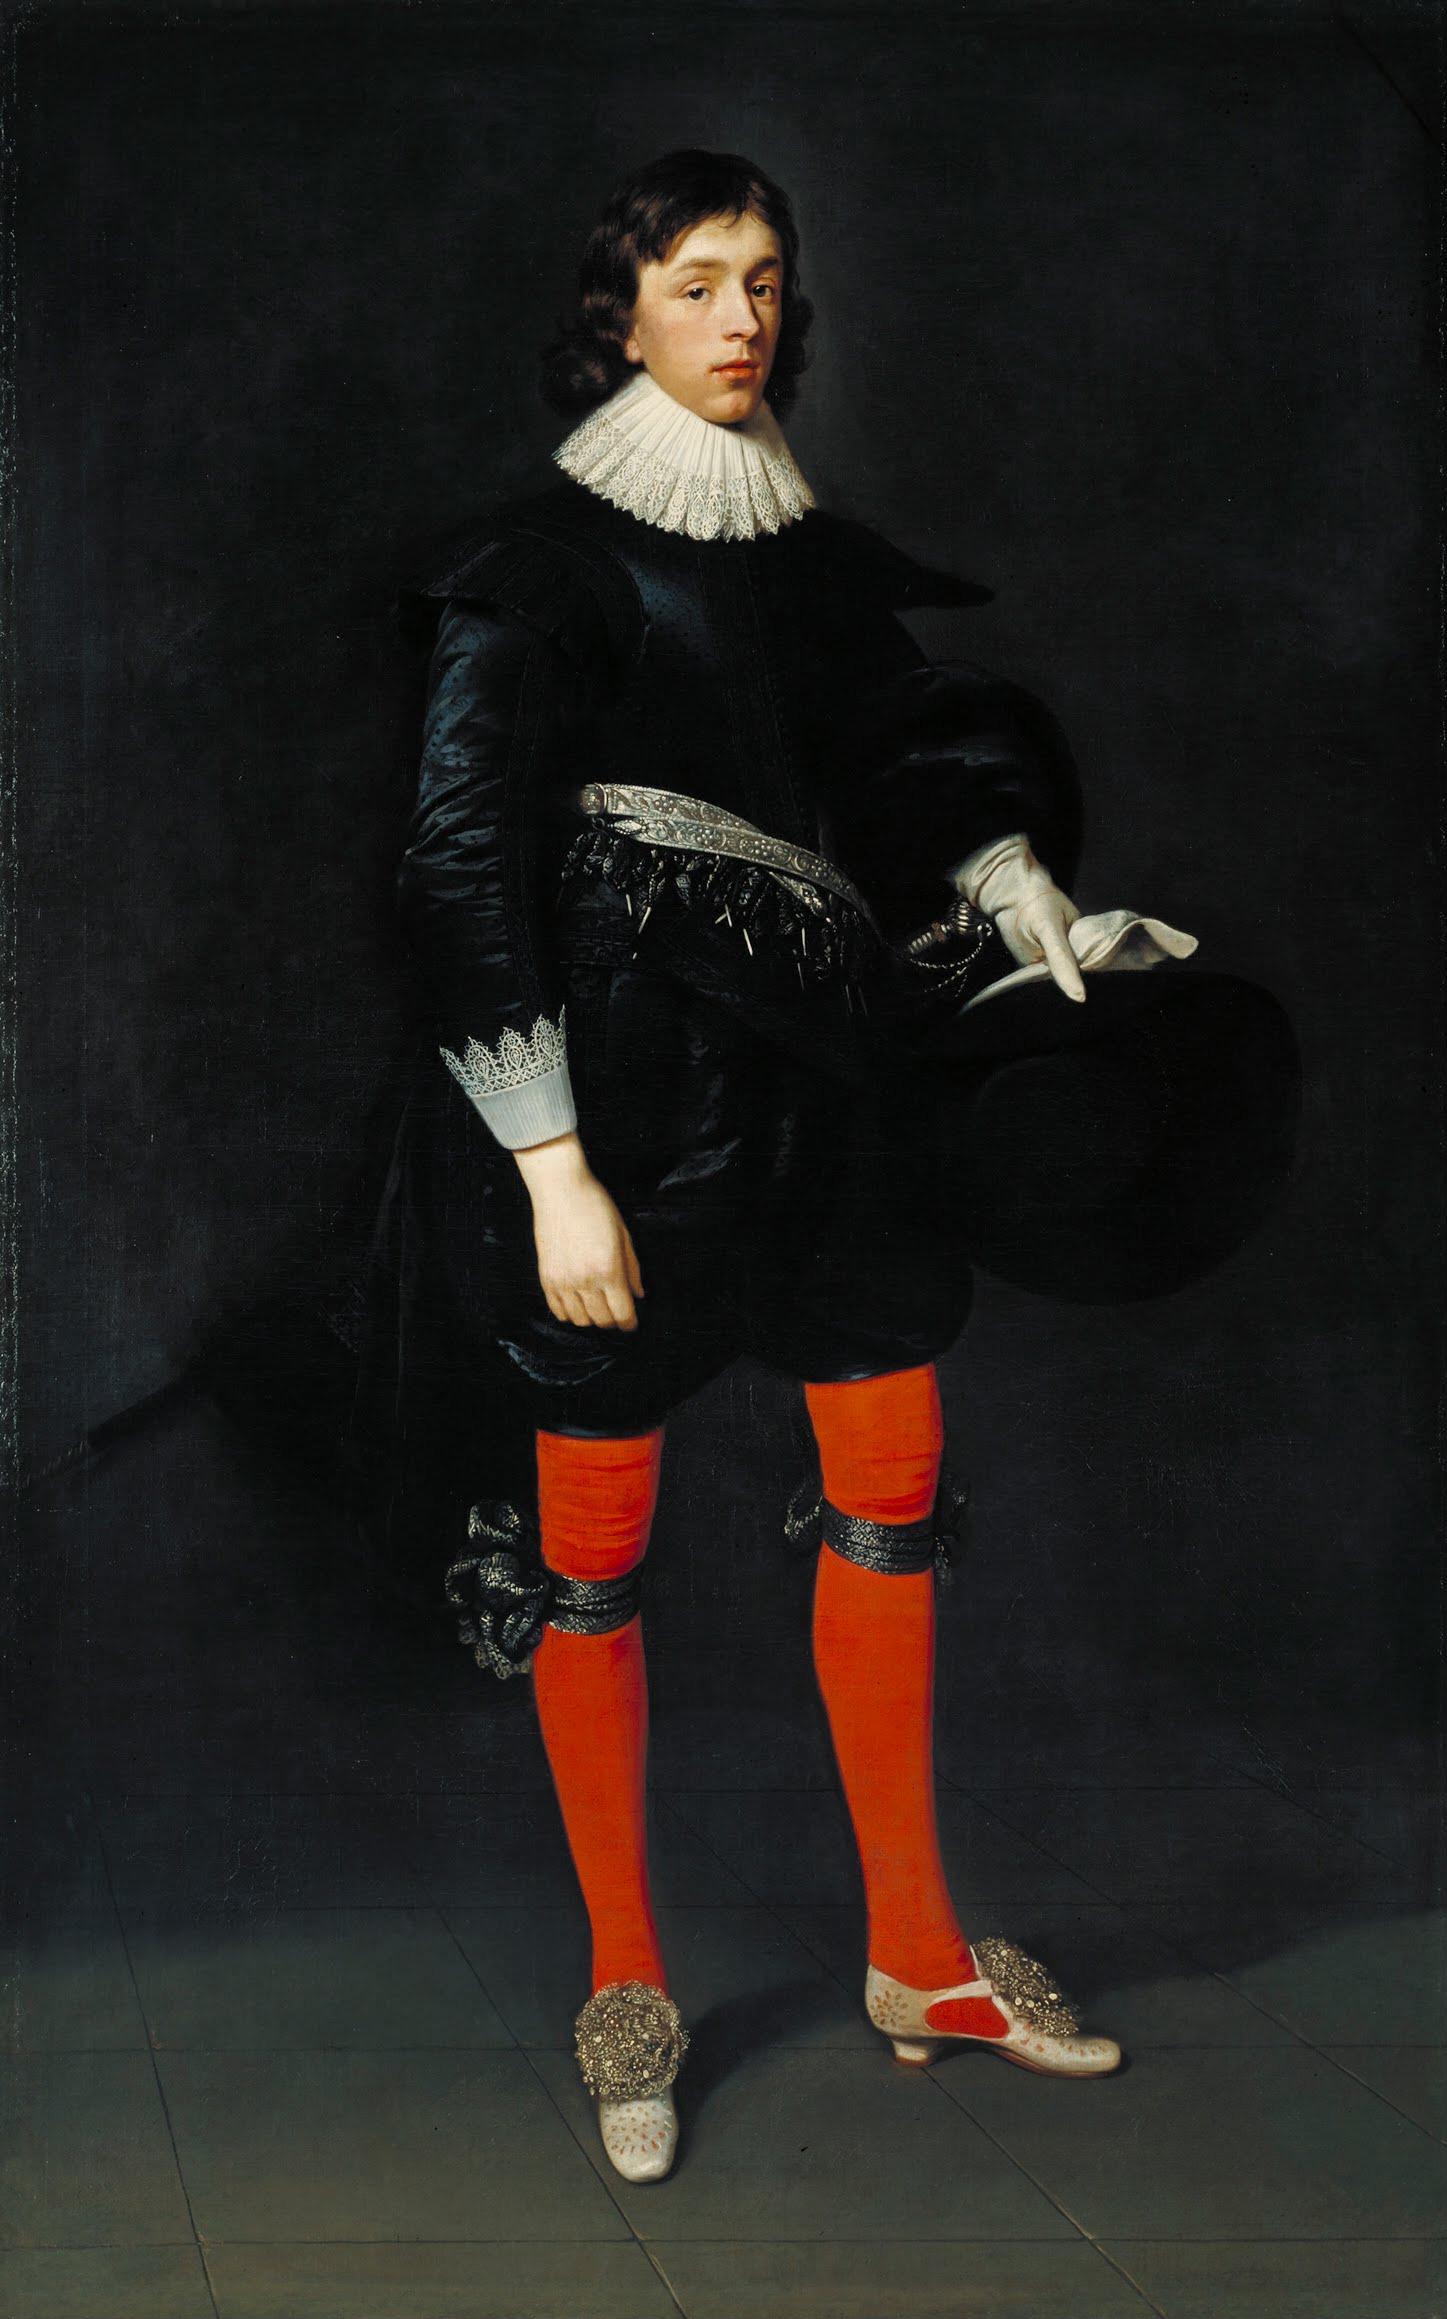 James Hamilton, Ear of Arran